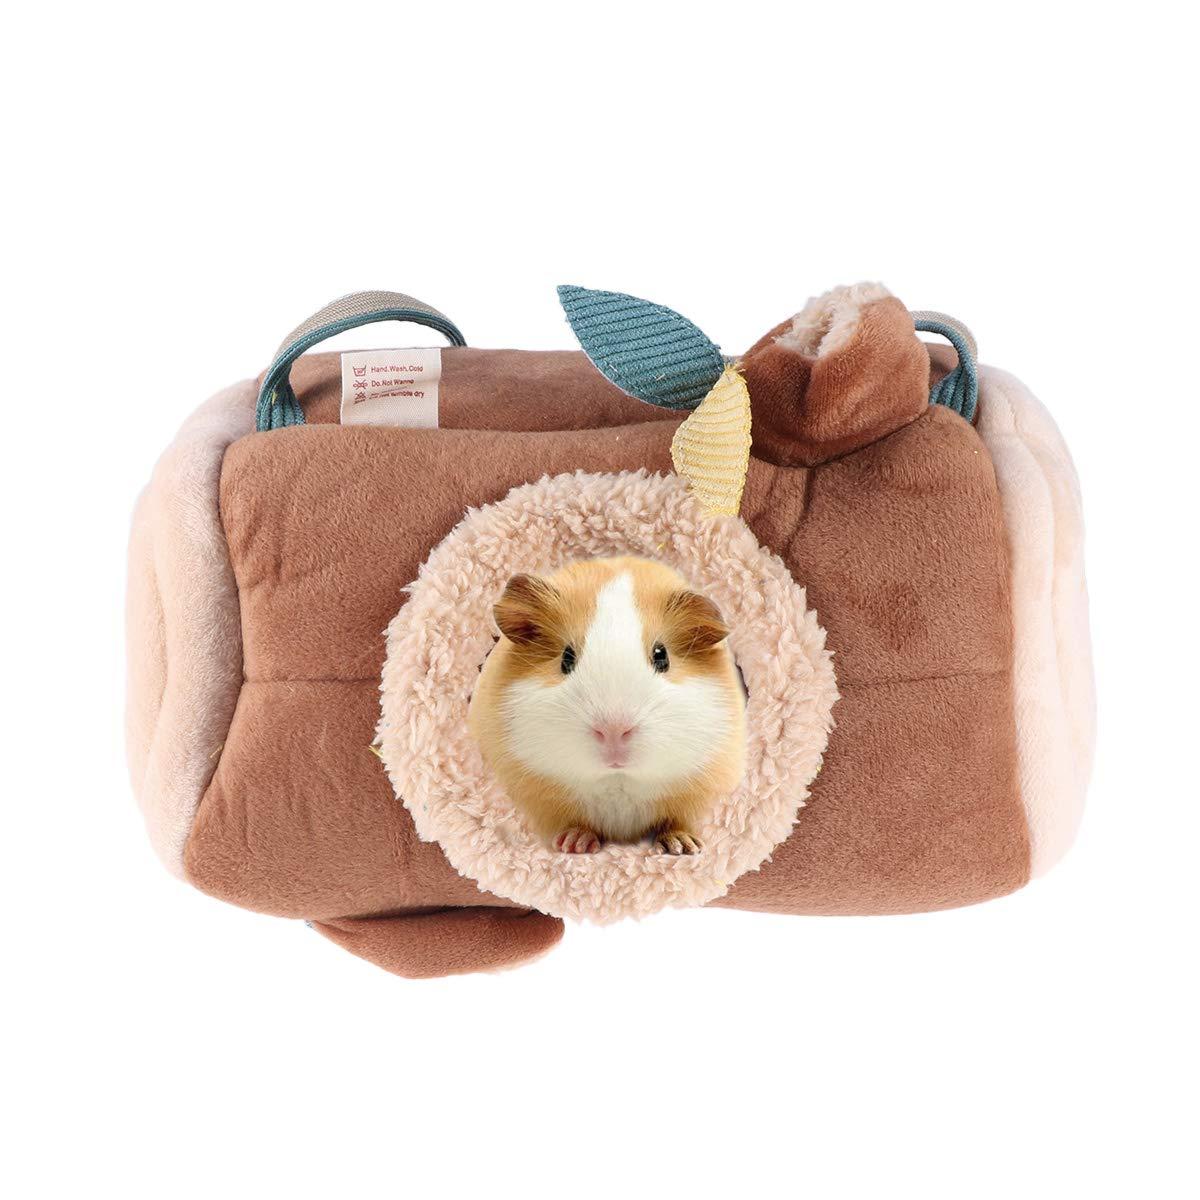 POPETPOP Ferret Hammock-Stump Hanging Guinea Pig Hamster Squirrel Bed Hammock for Cage Small Animal Rabbit Chinchilla Bed House for Rat Hedgehog Snuggle Sack